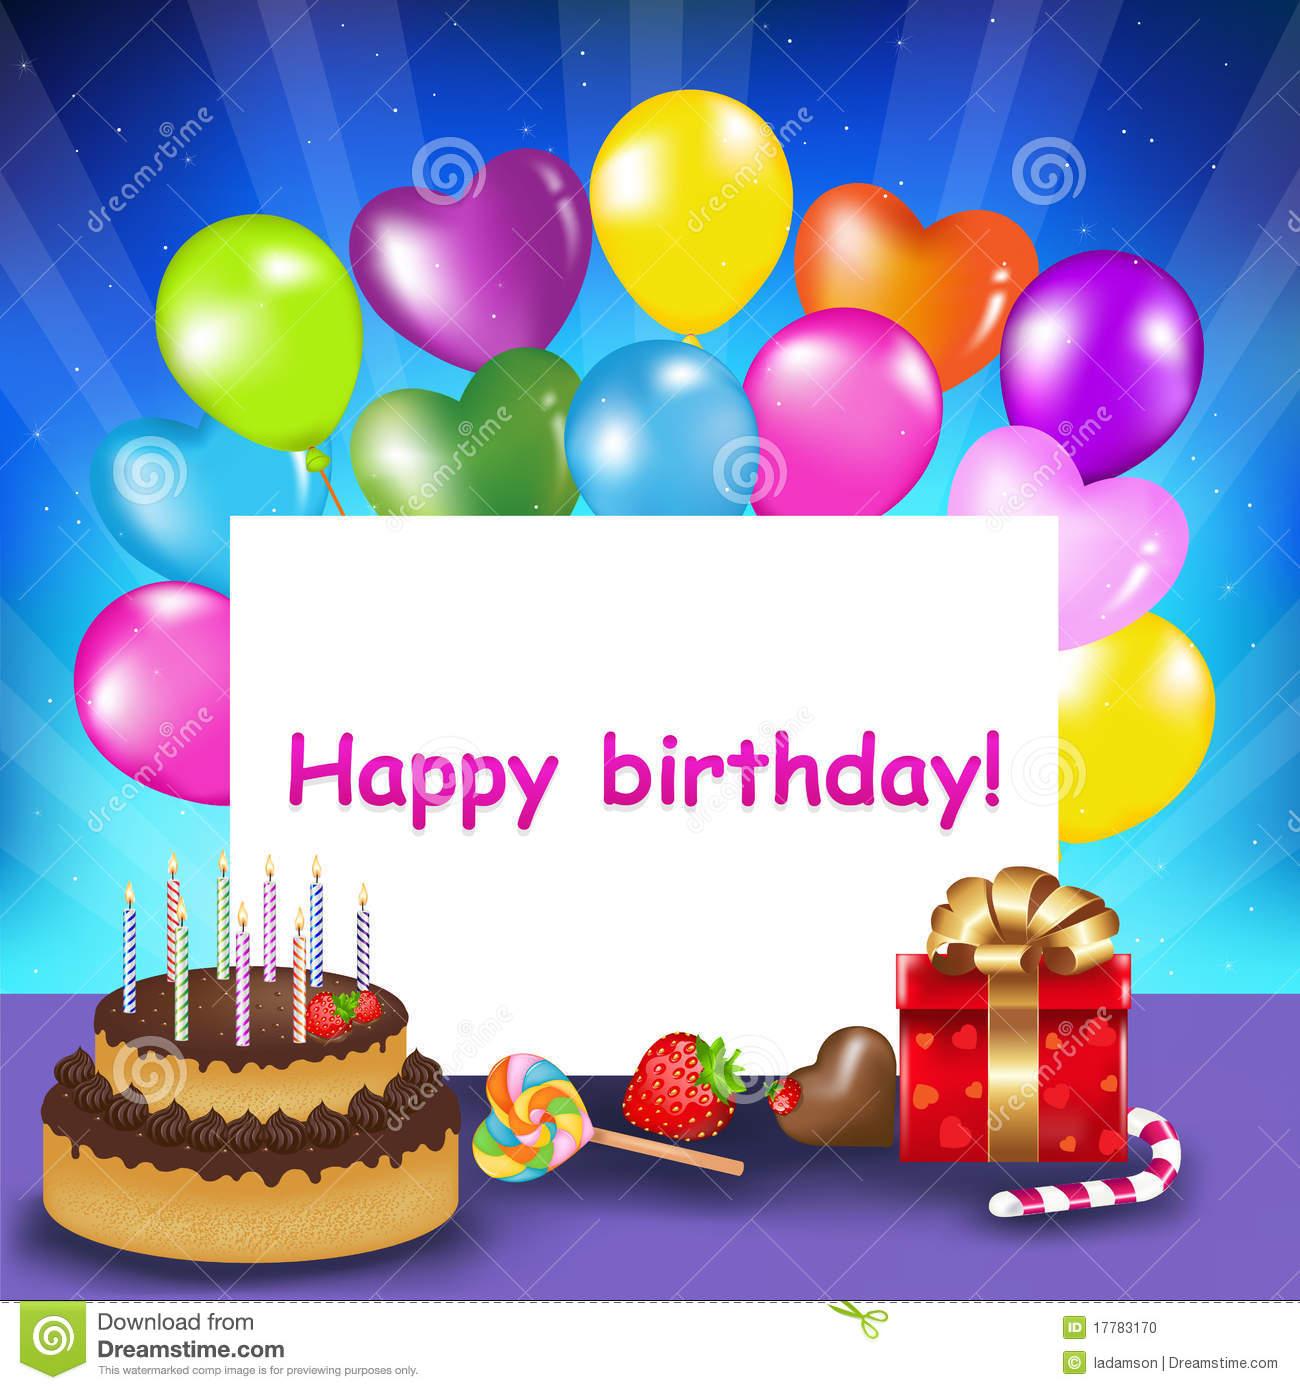 happy birthday card for - photo #1